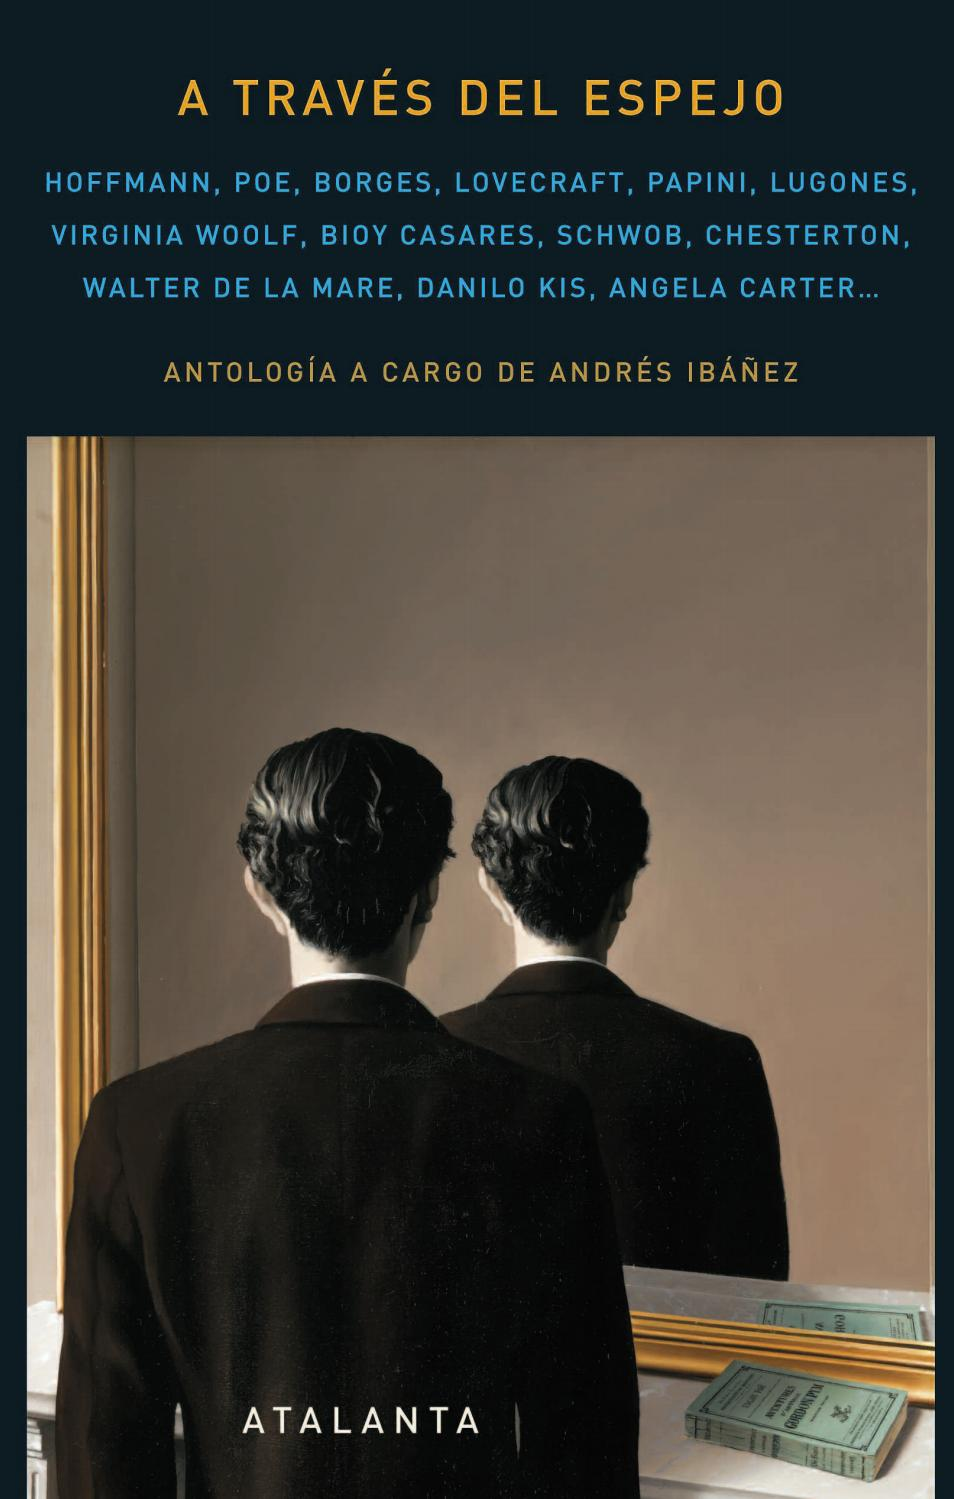 A través del espejo - Antologia by ATALANTA - issuu